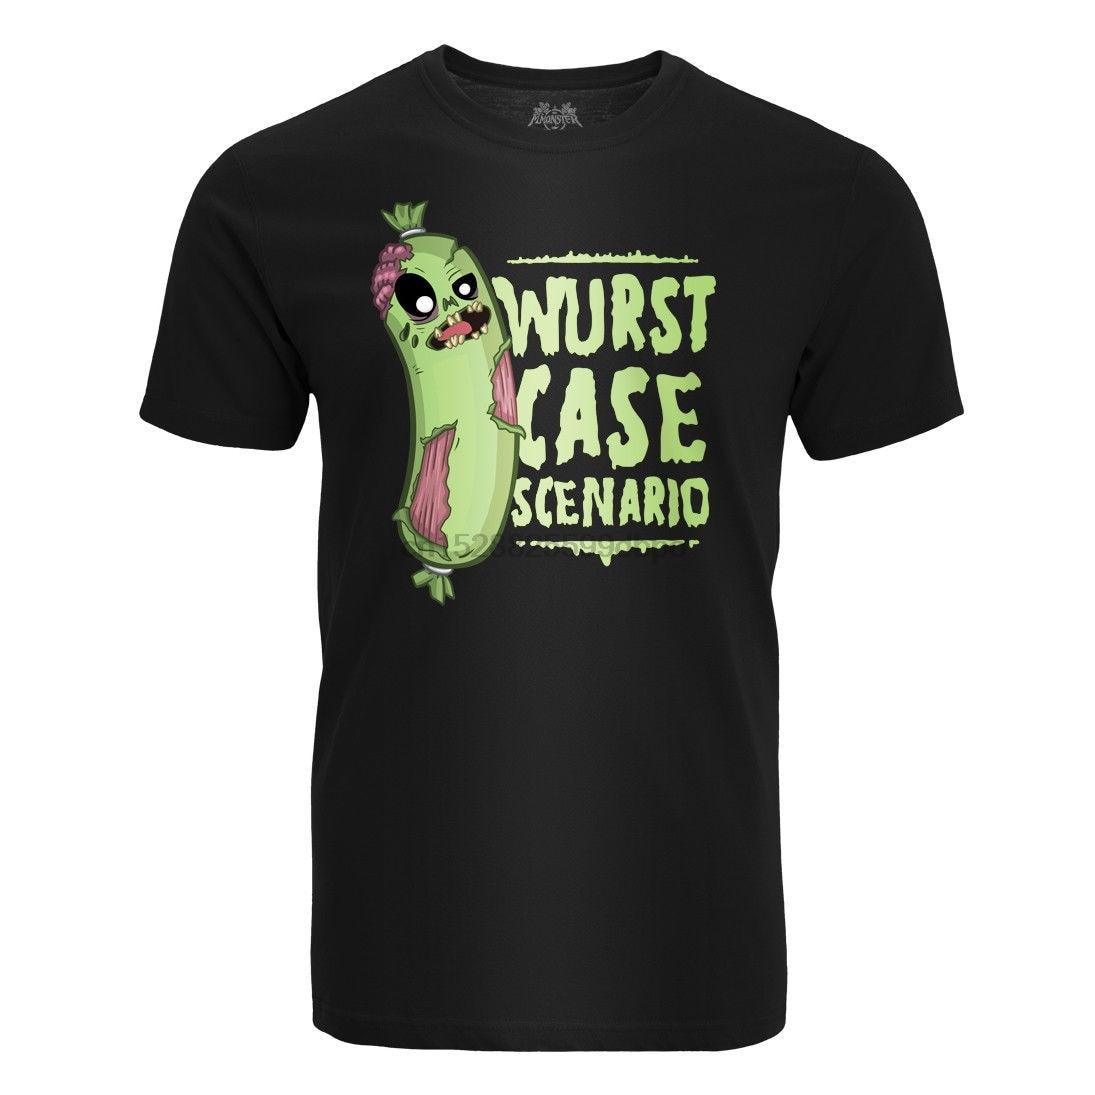 Camiseta de Herren Wurst caso Scenario friki Prepper Zombie ventilador S-3XL manga corta de algodón camiseta envío gratis TOP